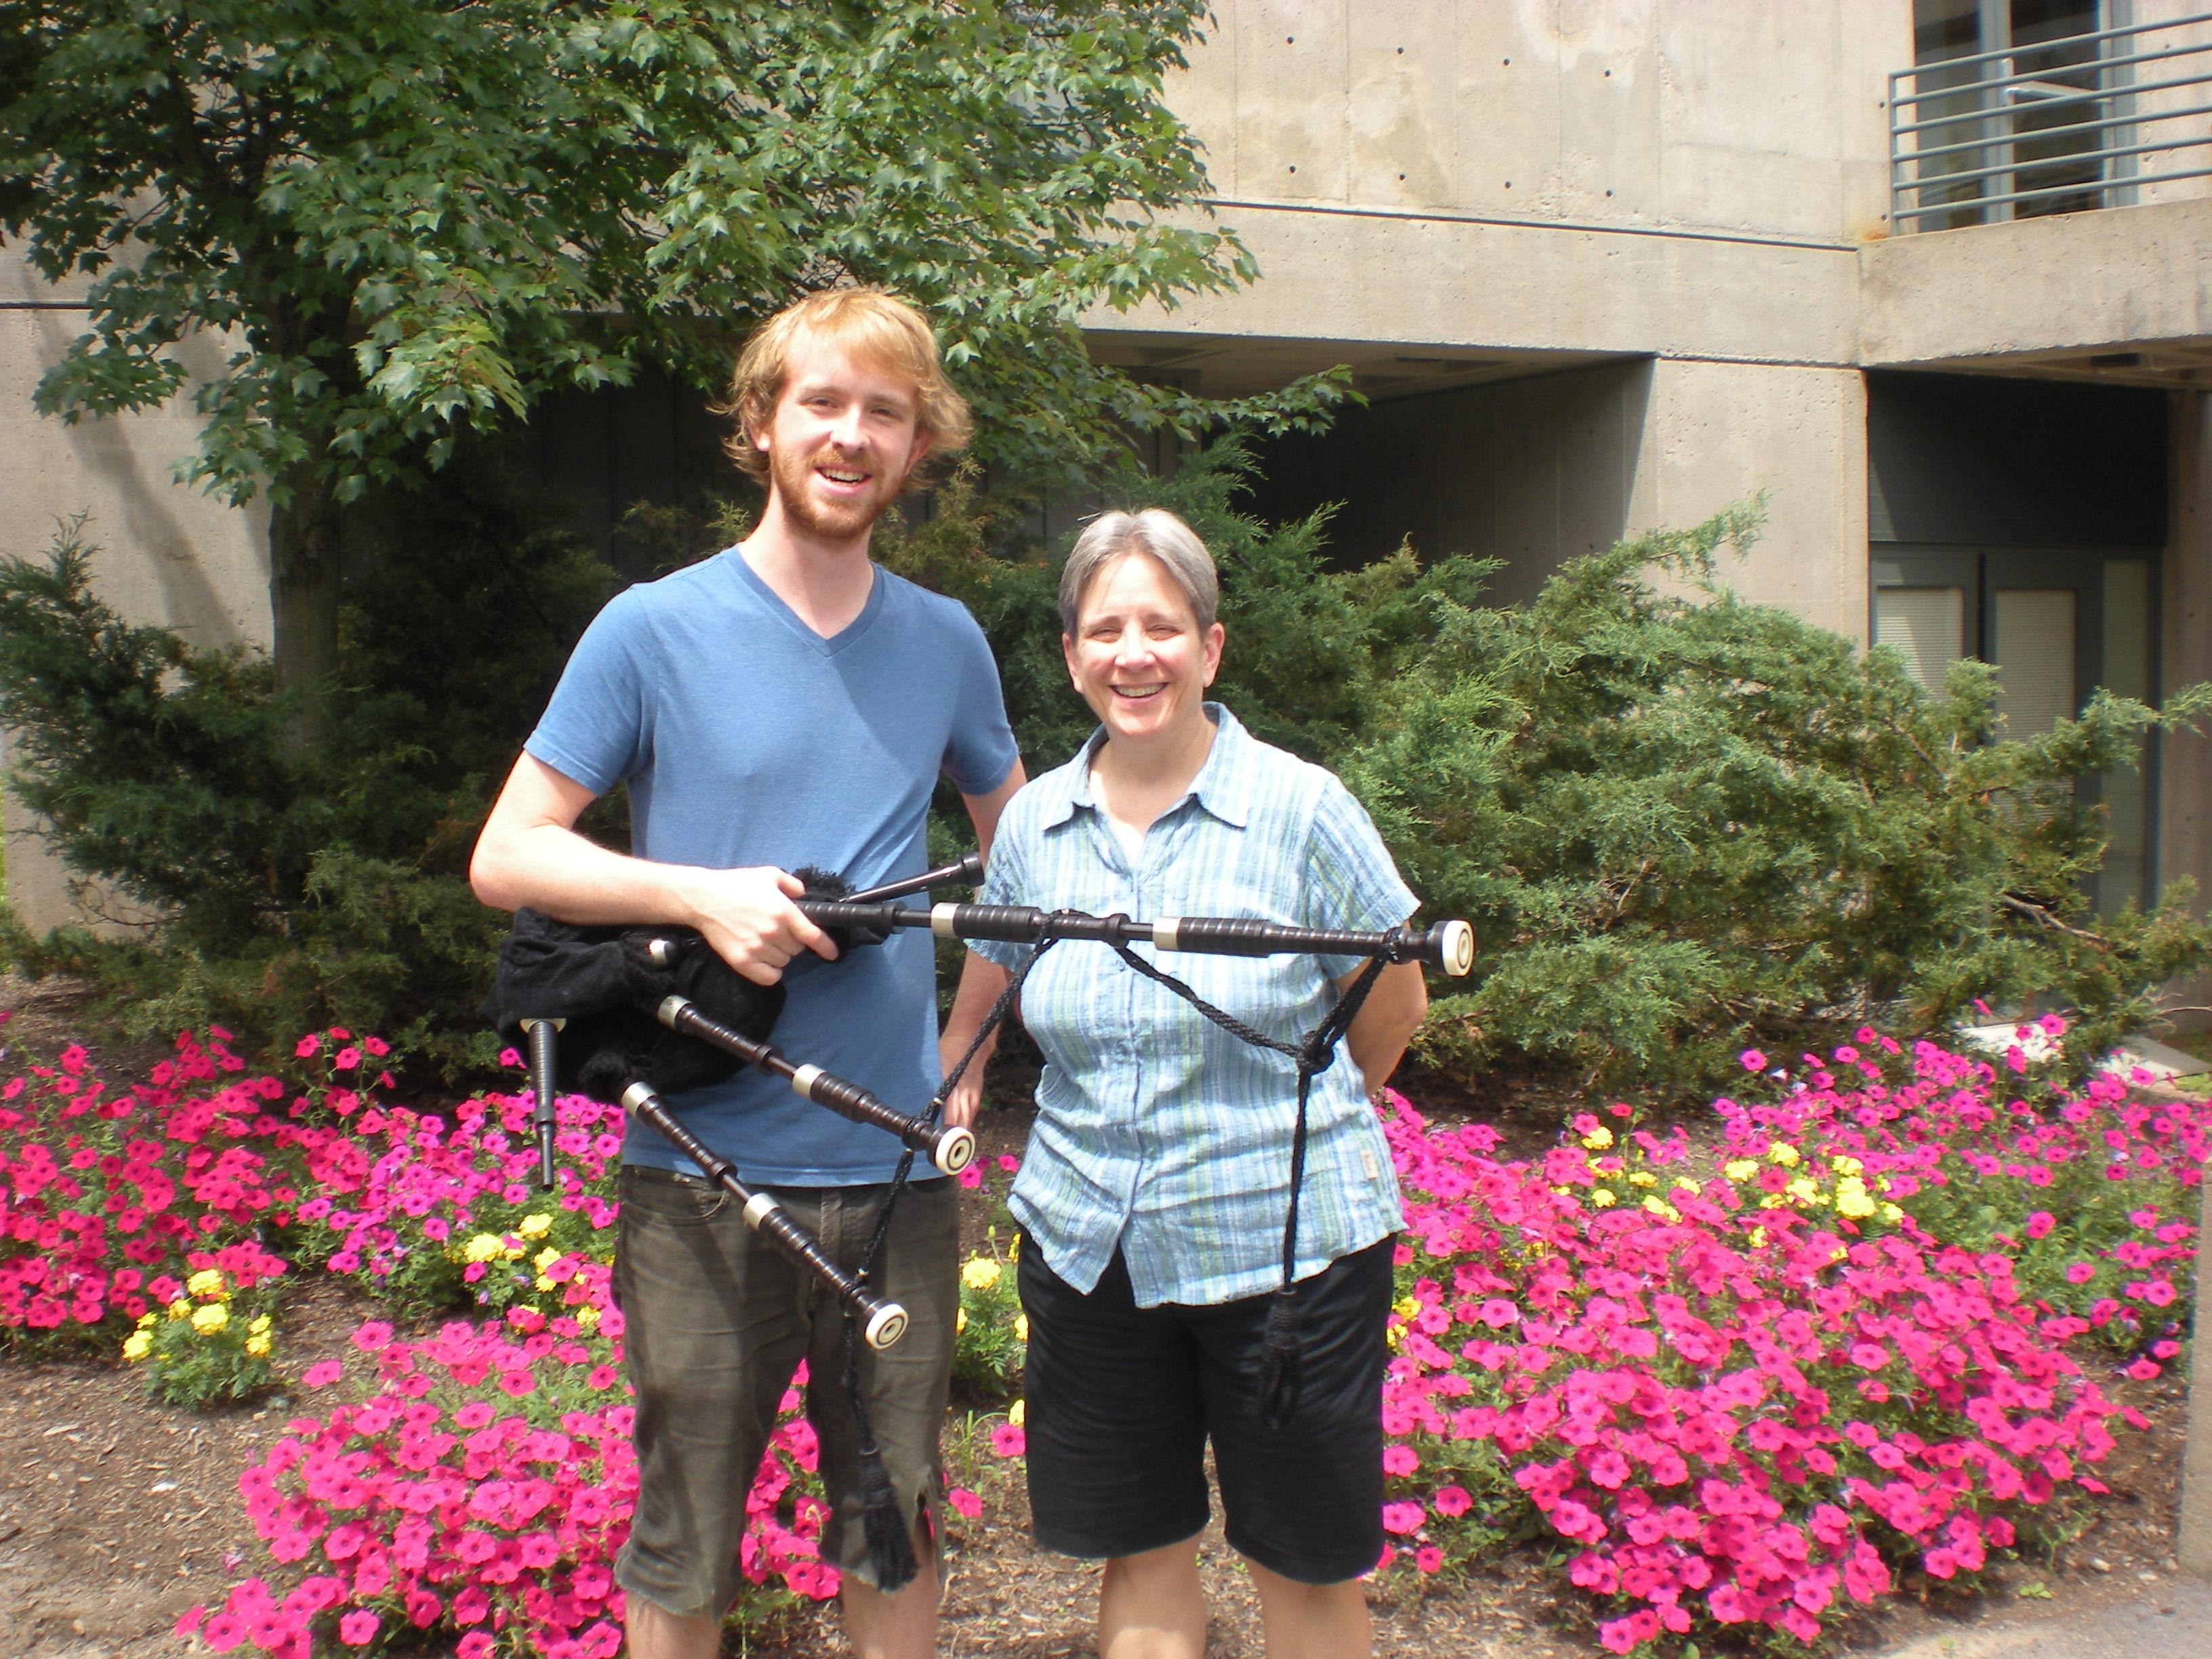 Nathaniel Livingston '14 with his advisor Prof. Lydia Hamessley.